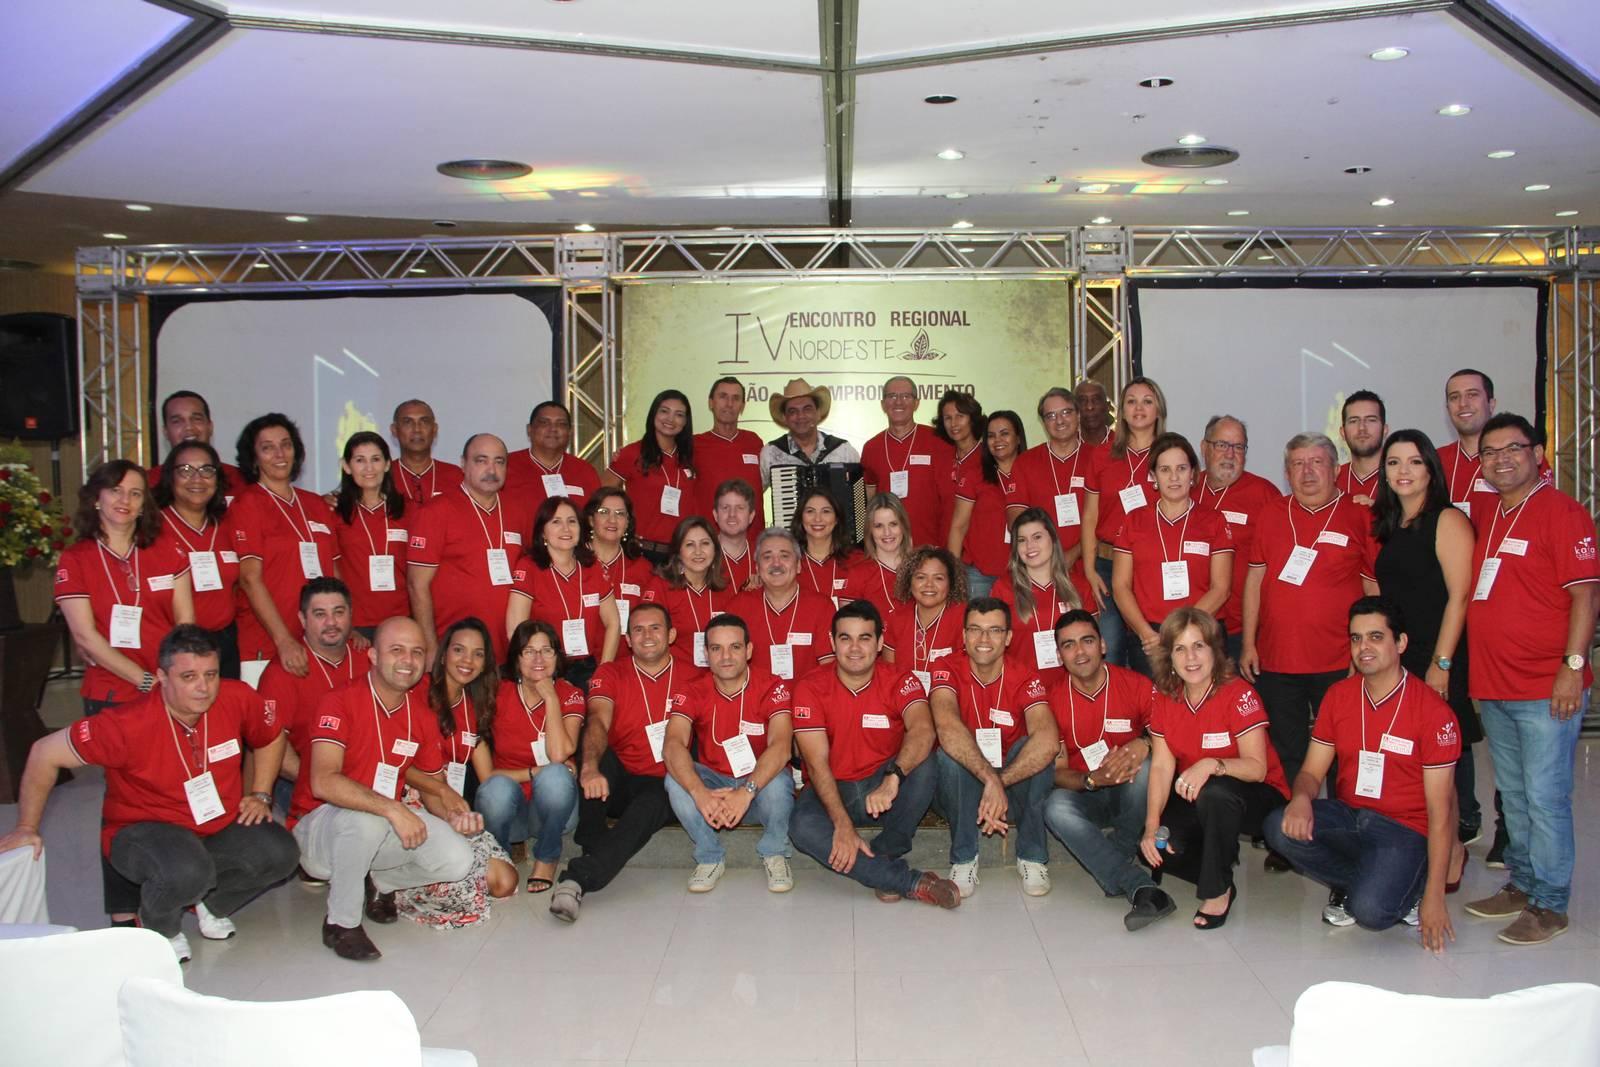 IV Encontro Regional do Nordeste - Bio Extratus (90)